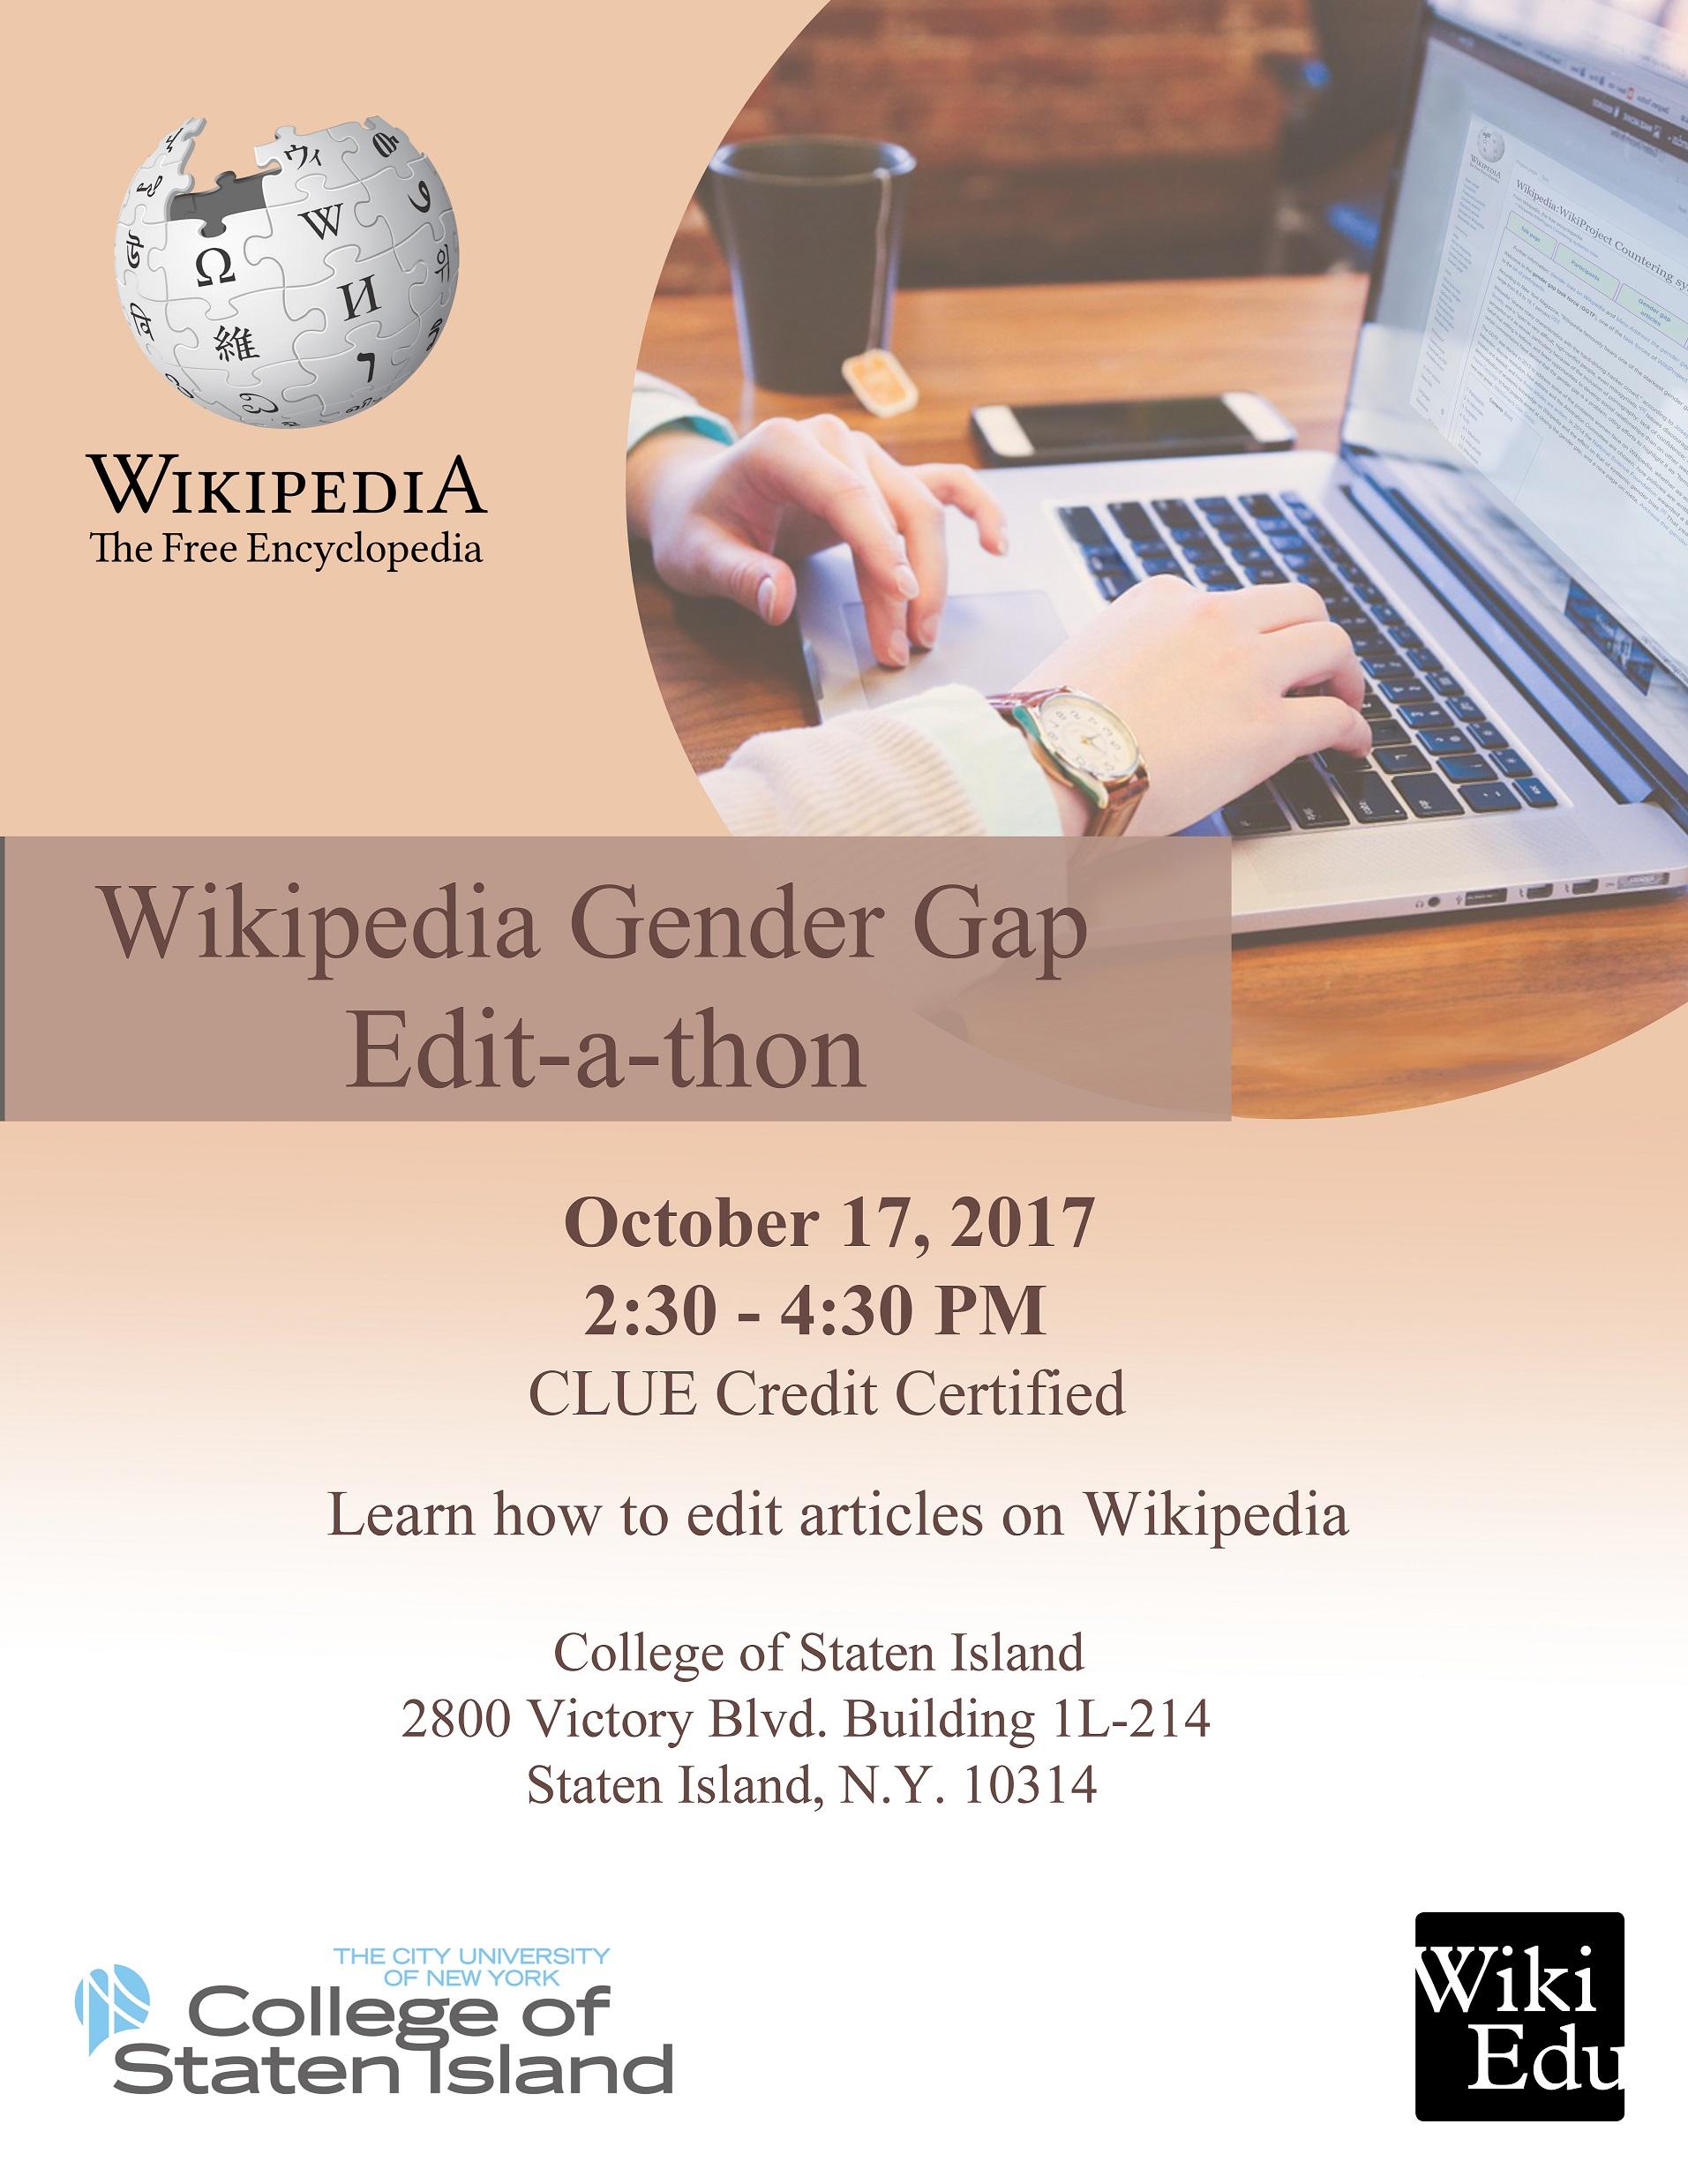 2017 Wikipedia Gender Gap Edit-a-thon Flyer